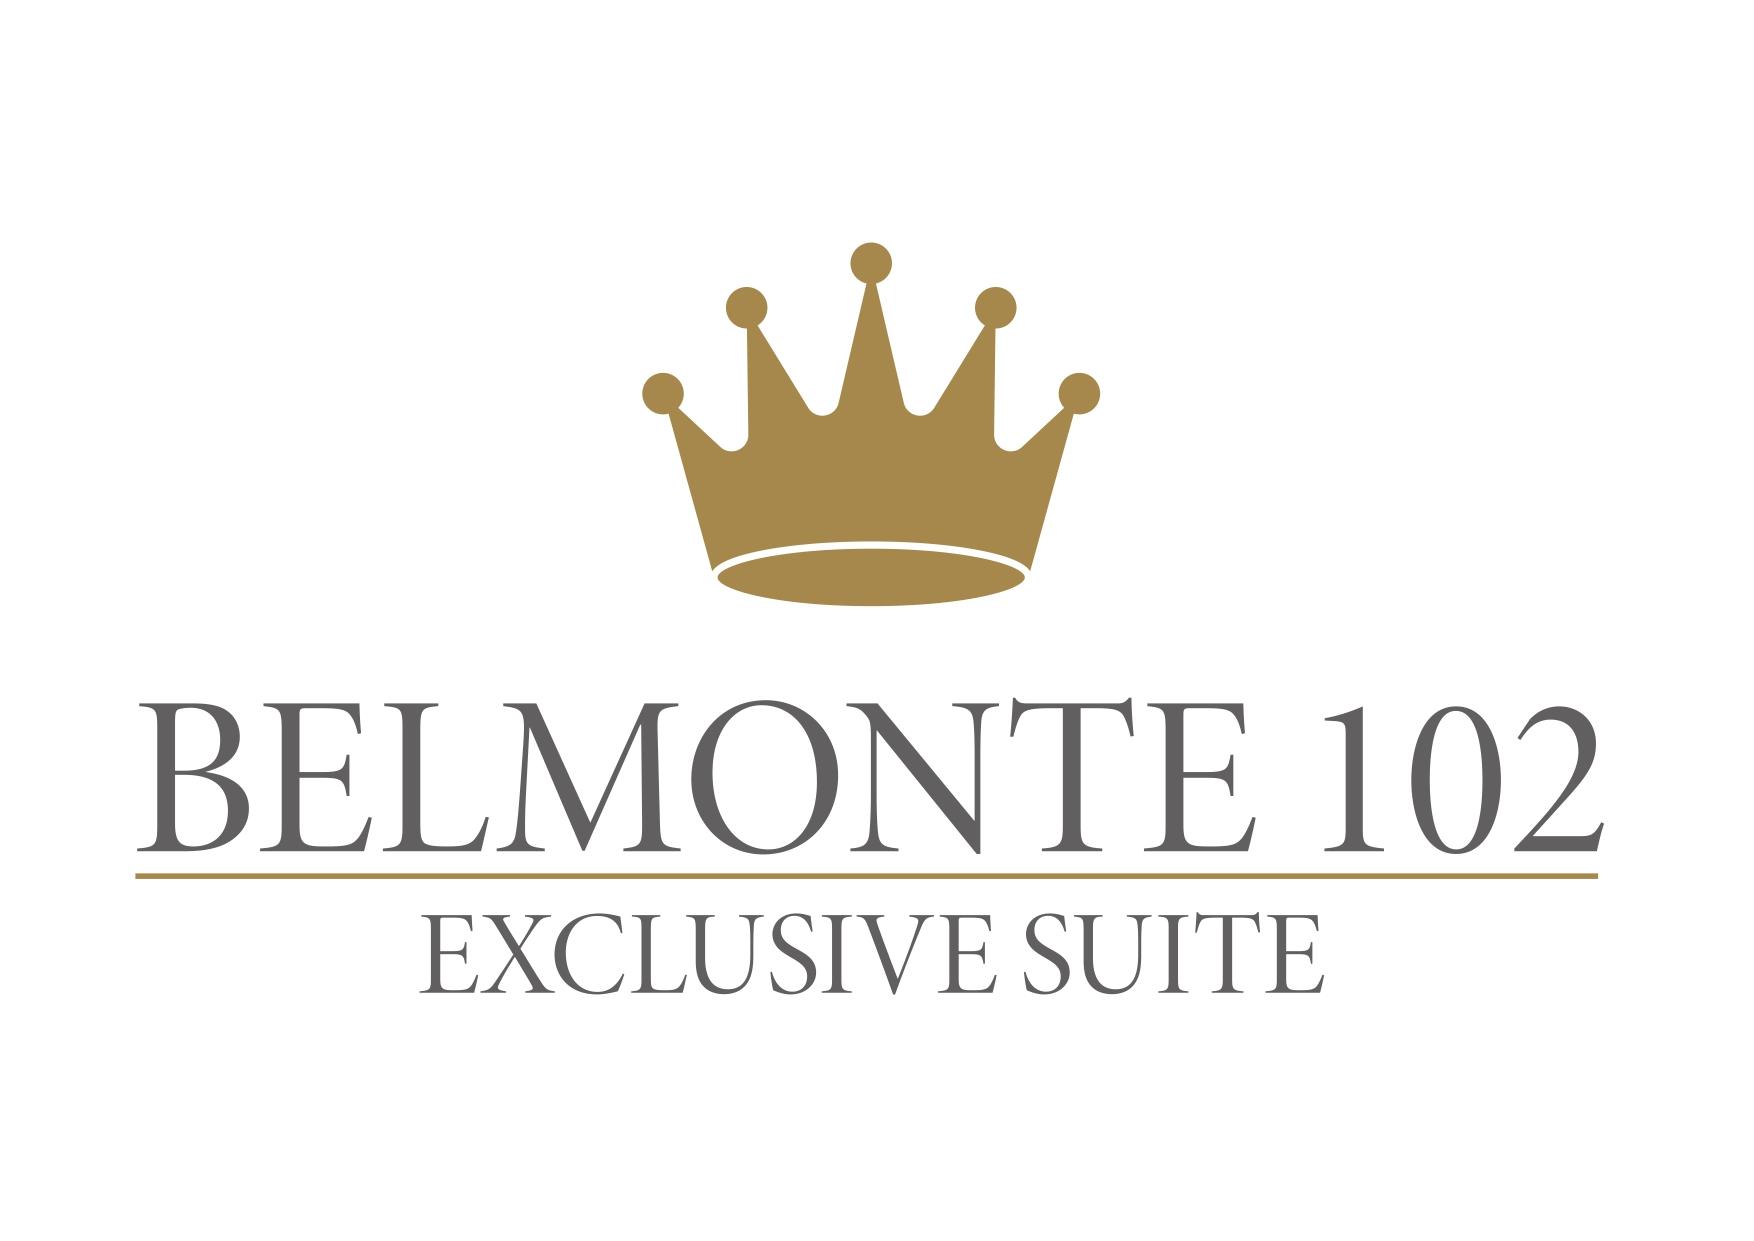 BELMONTE 102